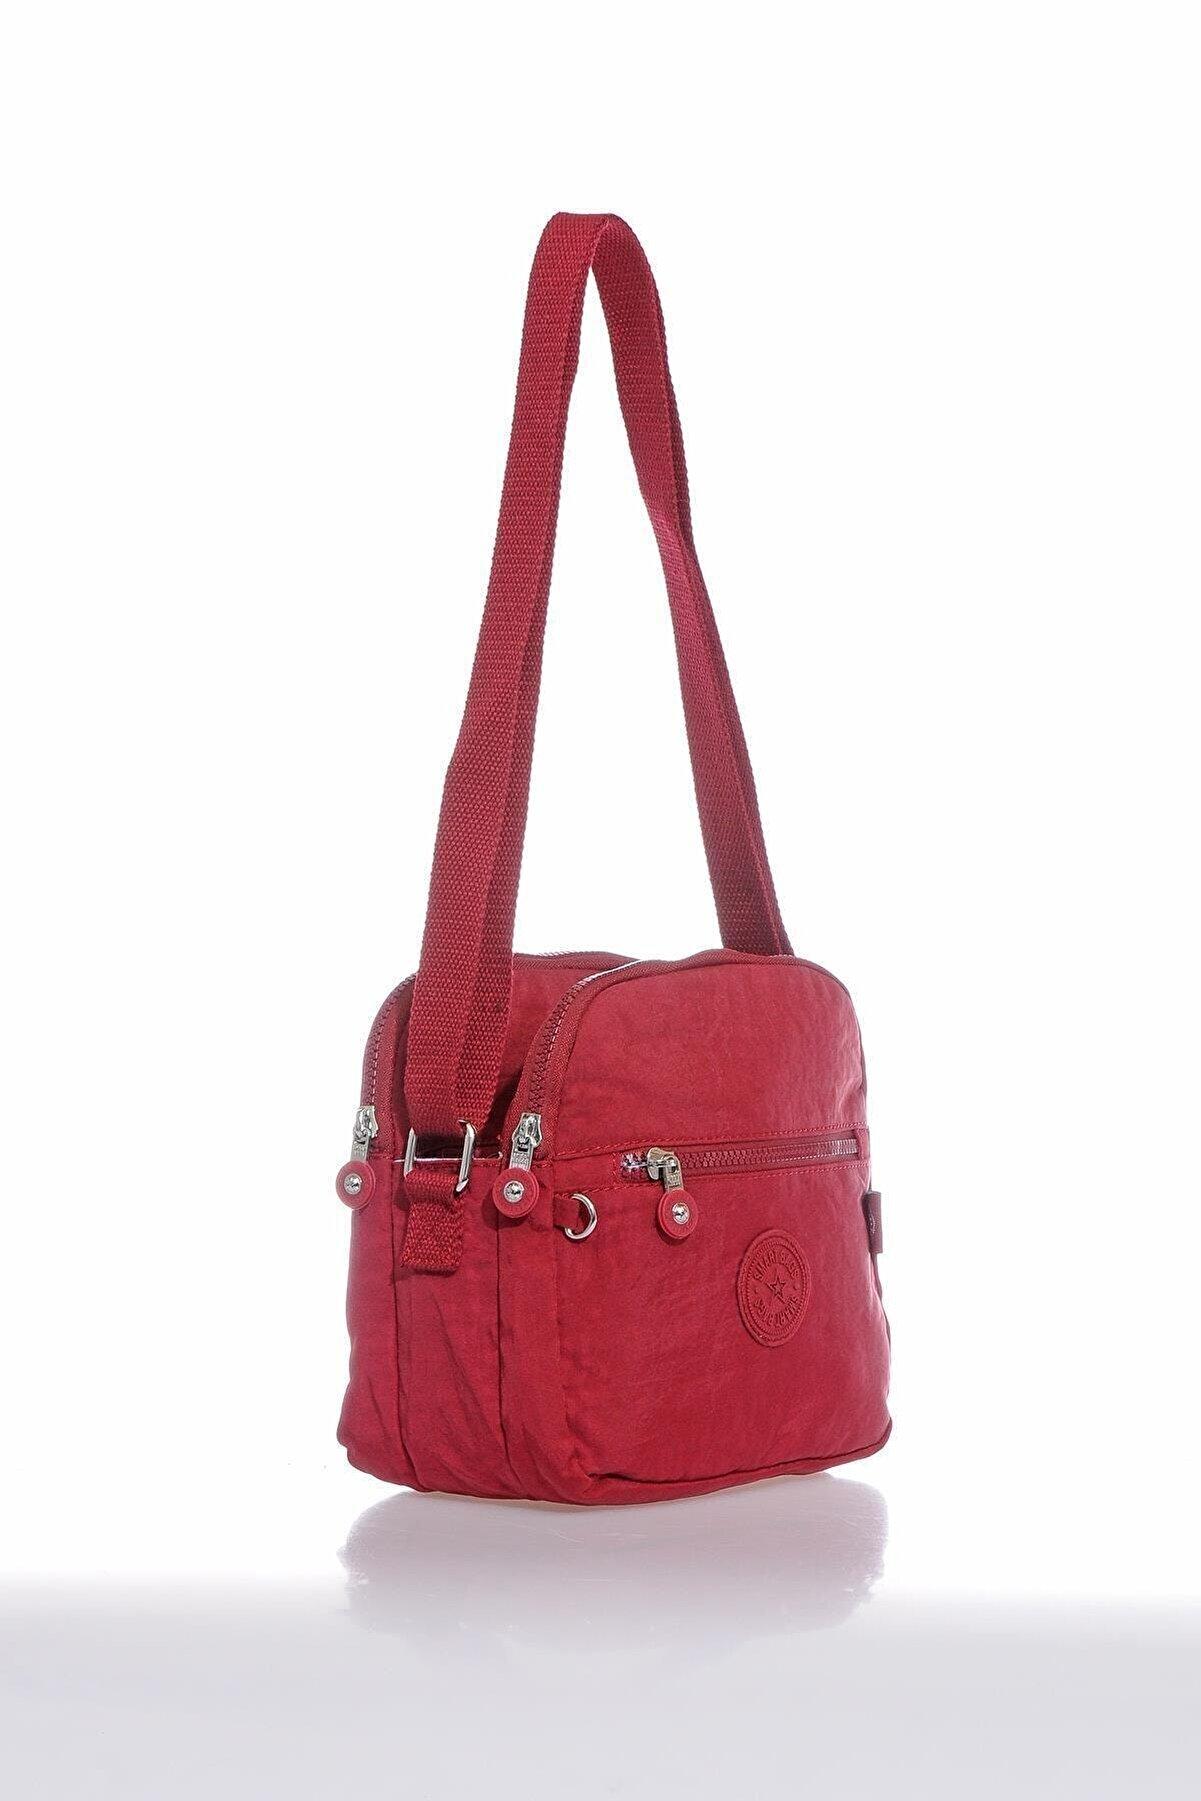 Smart Bags Smb3058-0021 Bordo Kadın Çapraz Çanta